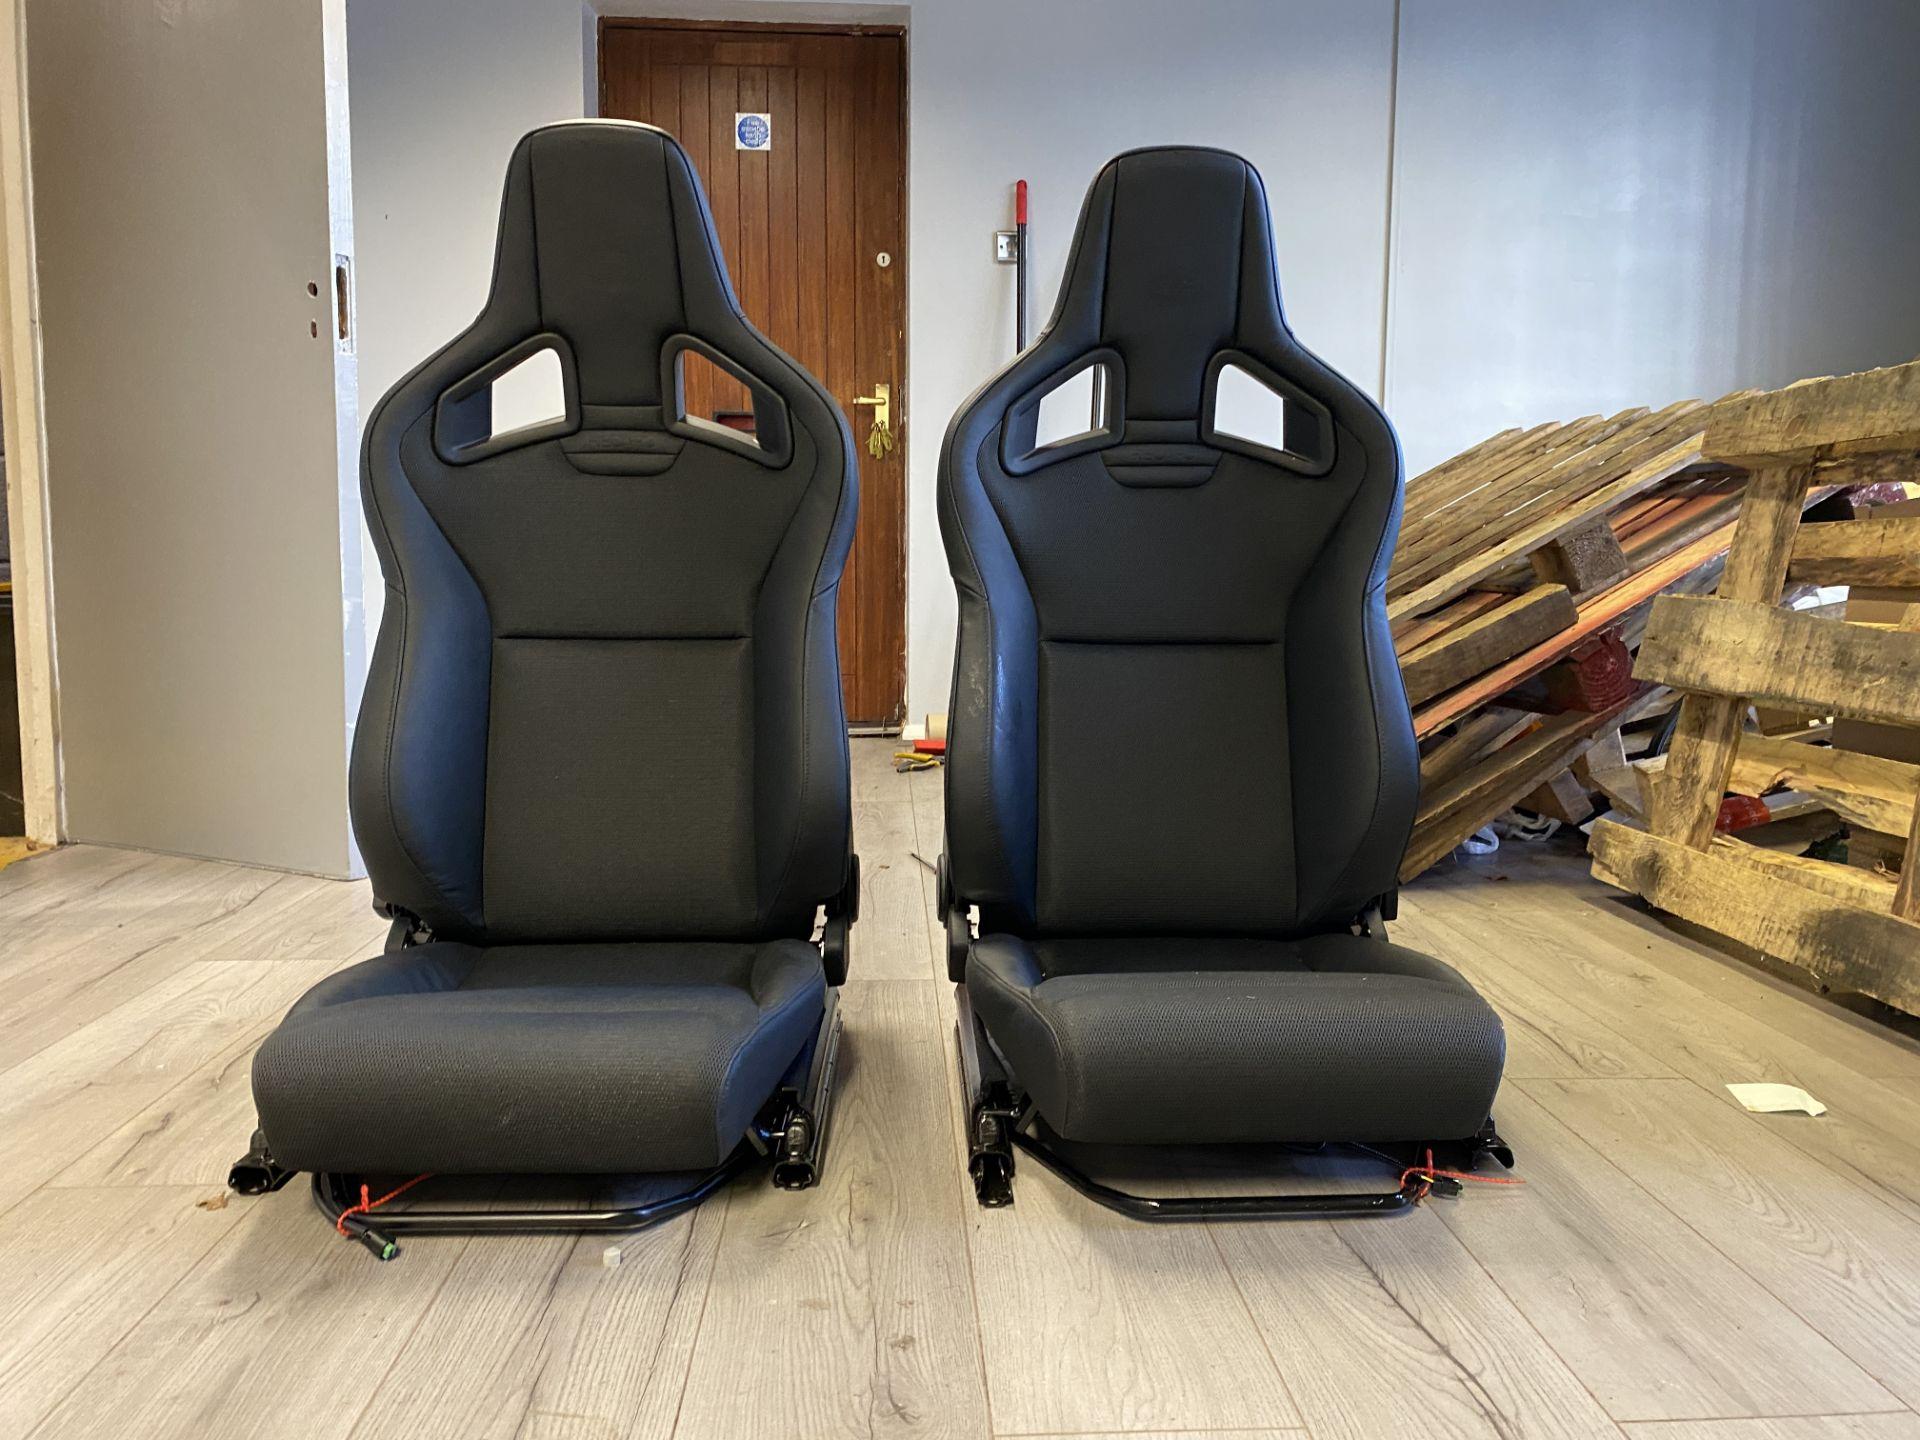 Pair of LH & RH Genuine Recaro Defender Heated Seats - Image 3 of 35